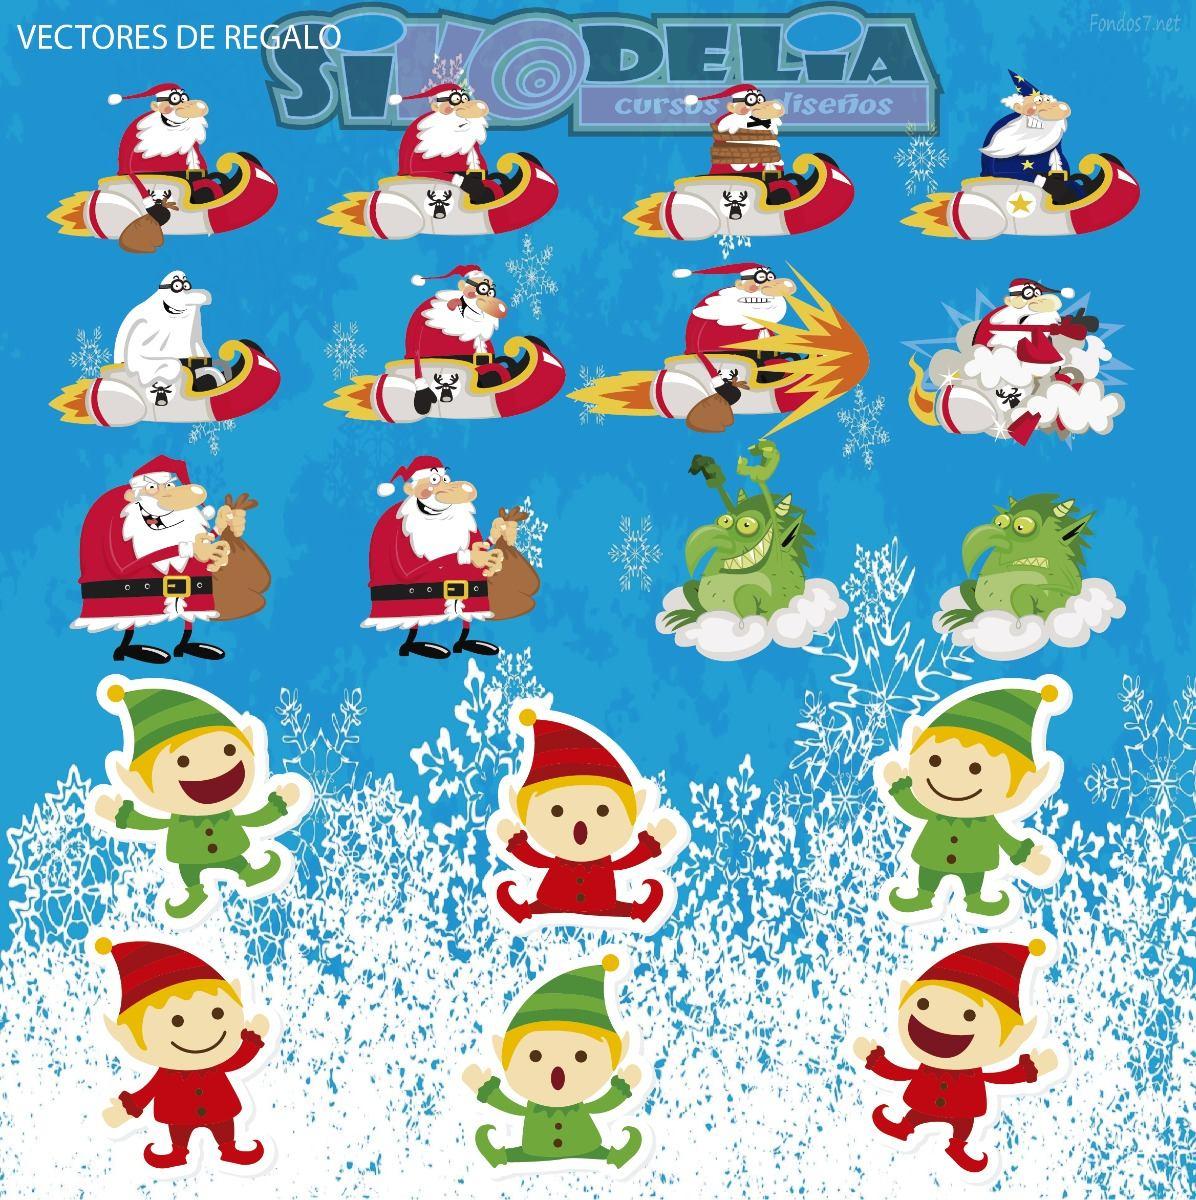 Vectores De Navidad Para Costalitos Para Corel E Illustrator ...